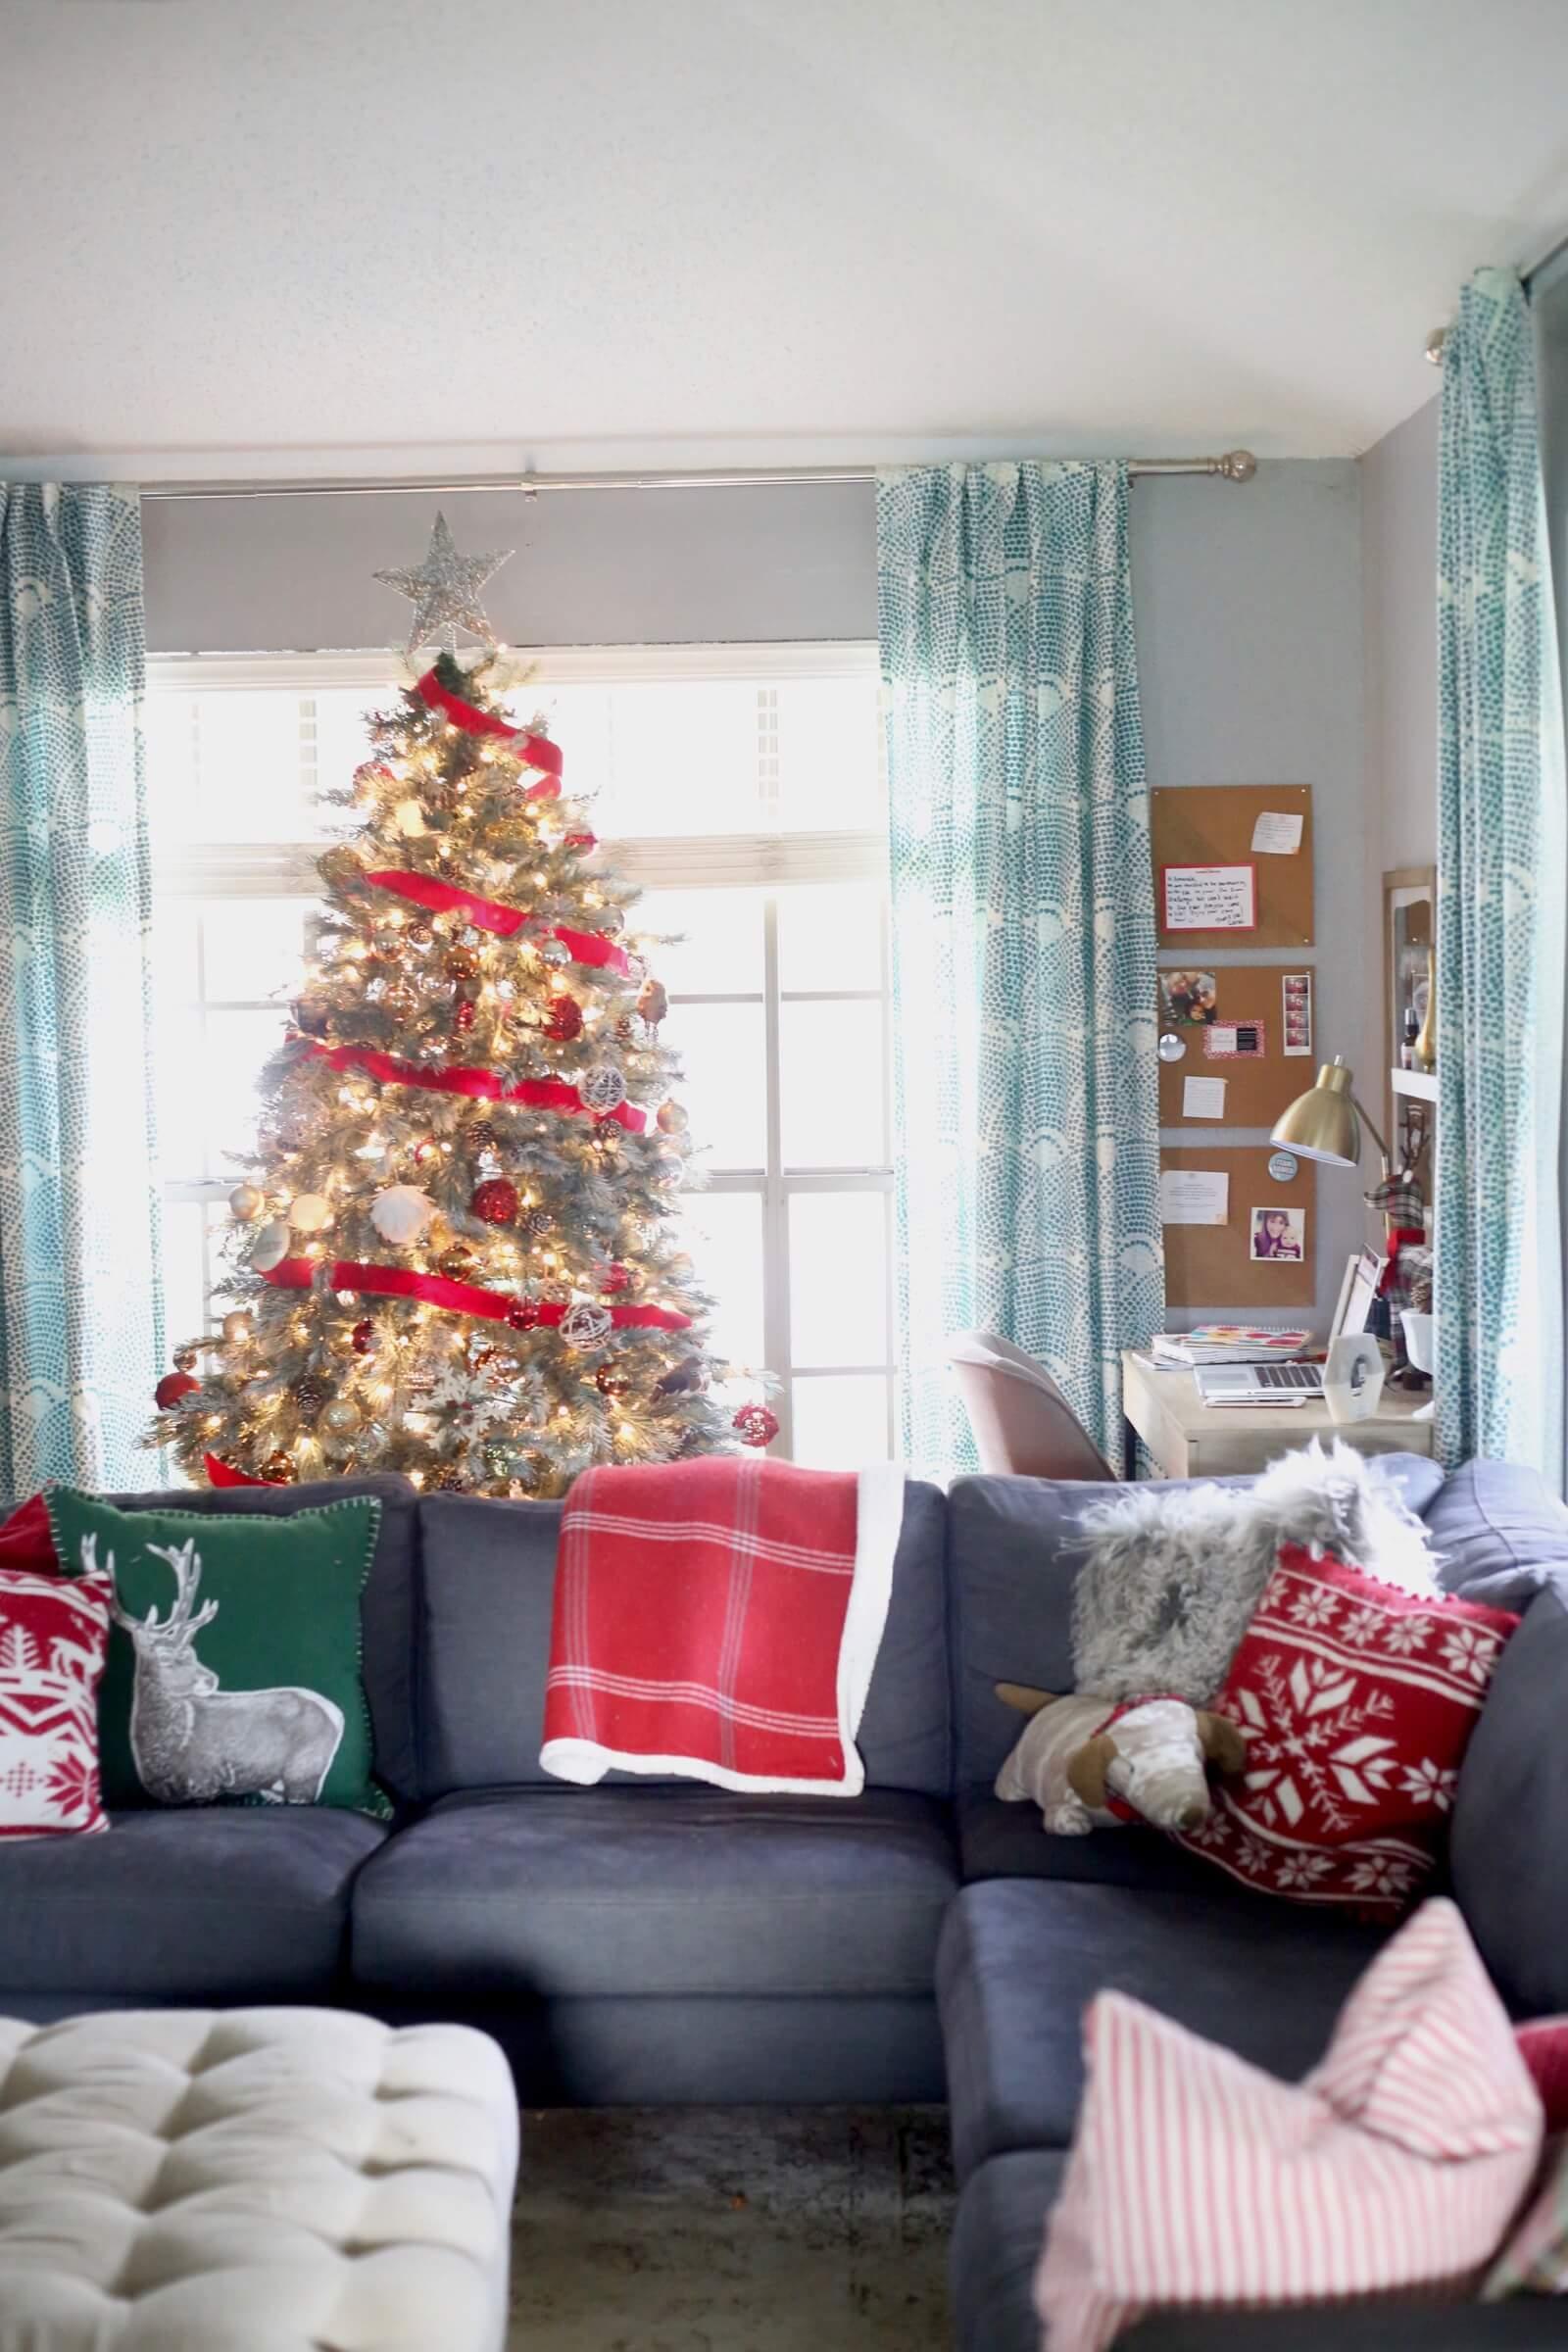 Christmas Living Room Decor Ideas thewowdecor (11)